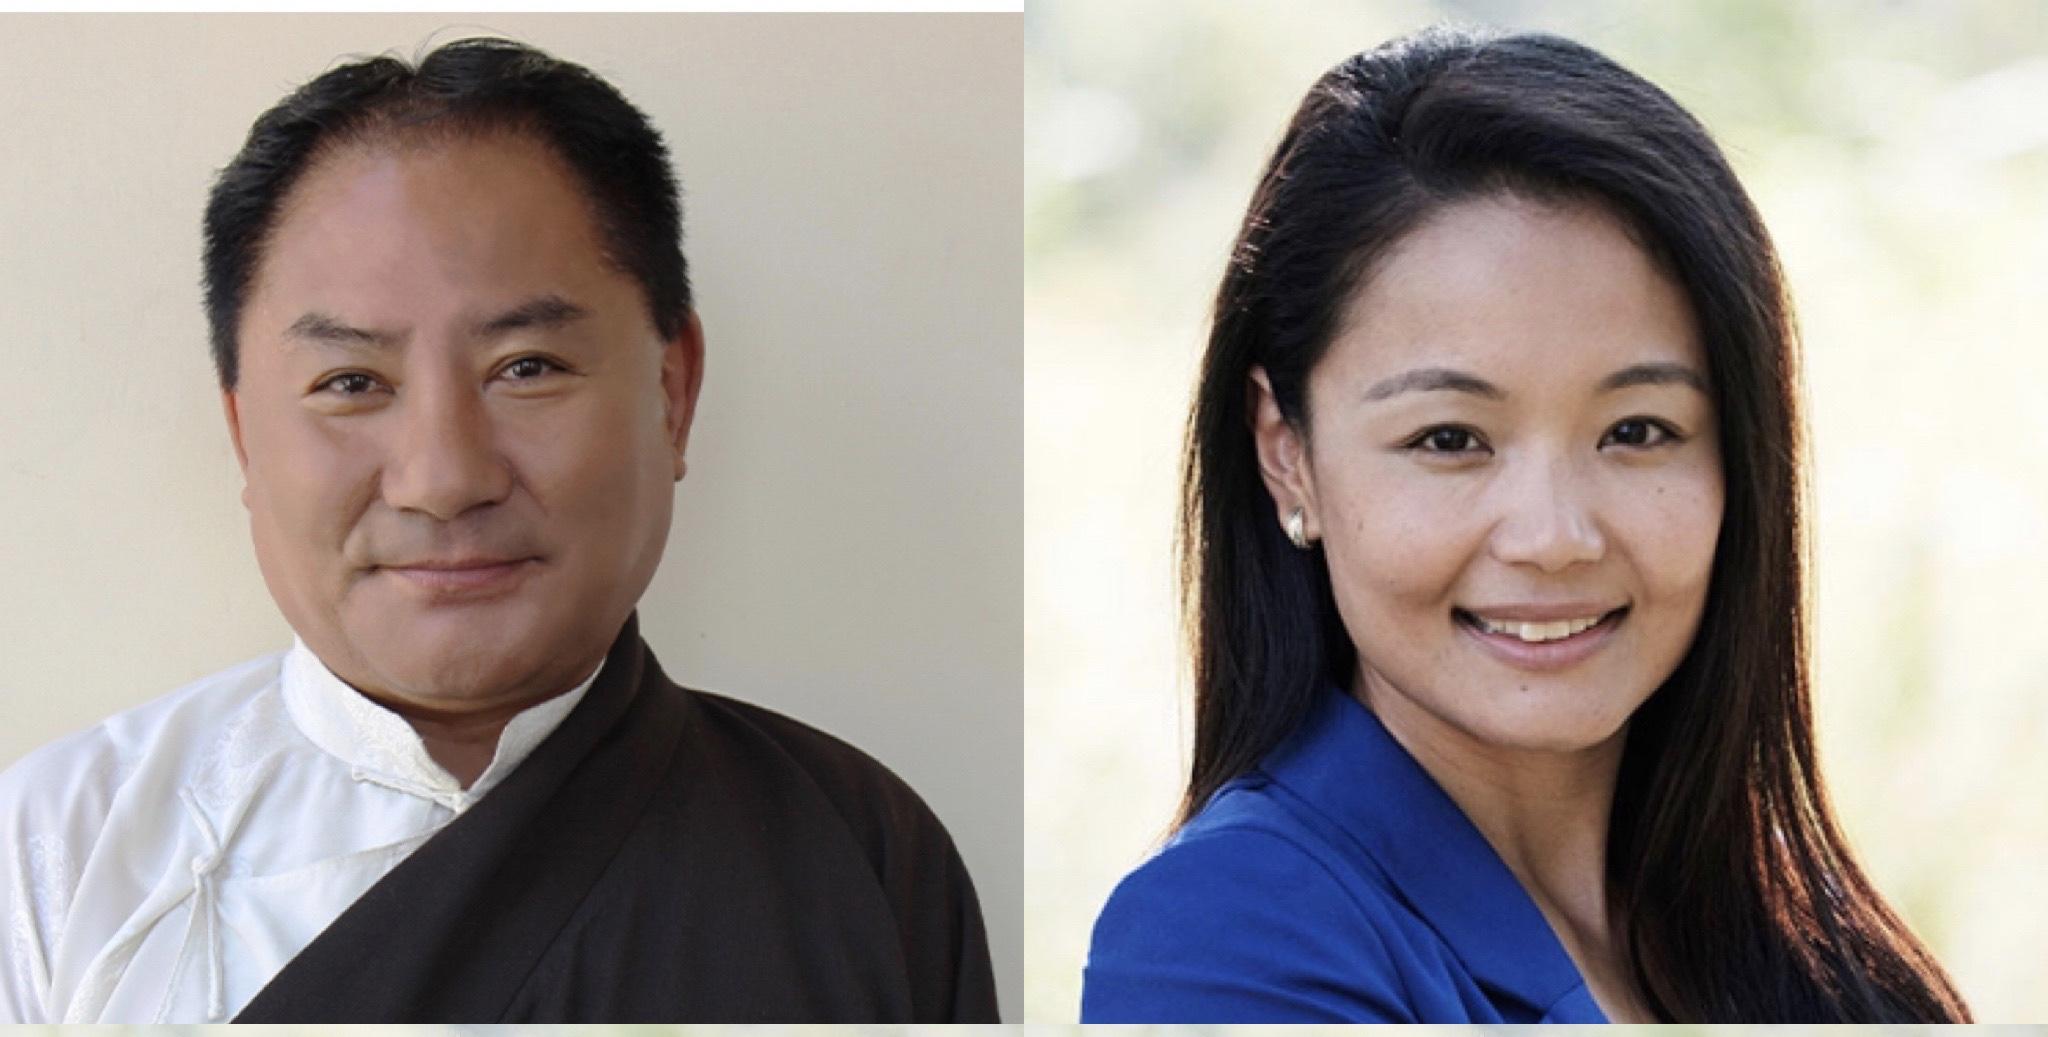 Speaker Pema Jungney congratulates and commends MPP Bhutila Karpoche on the Historic passage of Bill-131